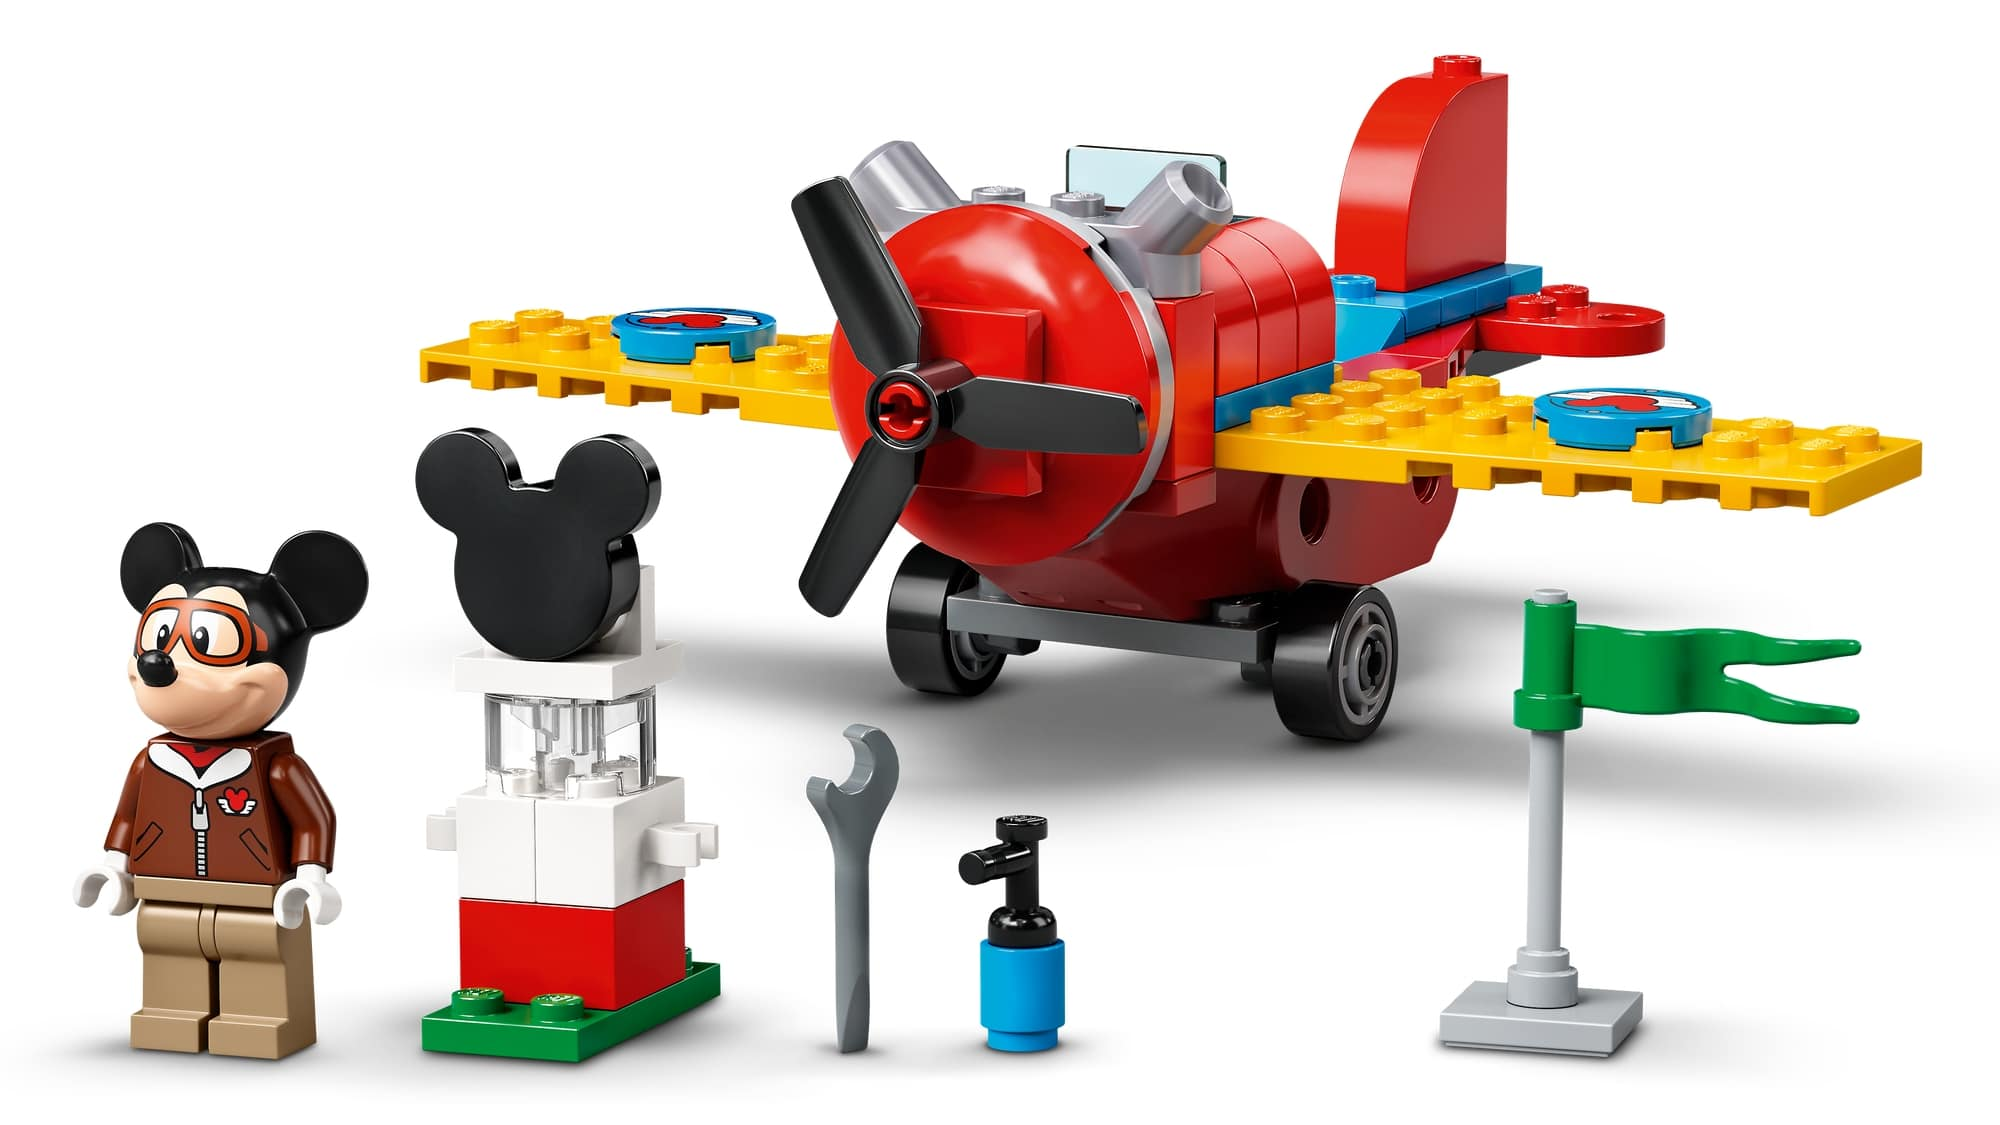 LEGO Disney 10772 Mickys Propellerflugzeug 4